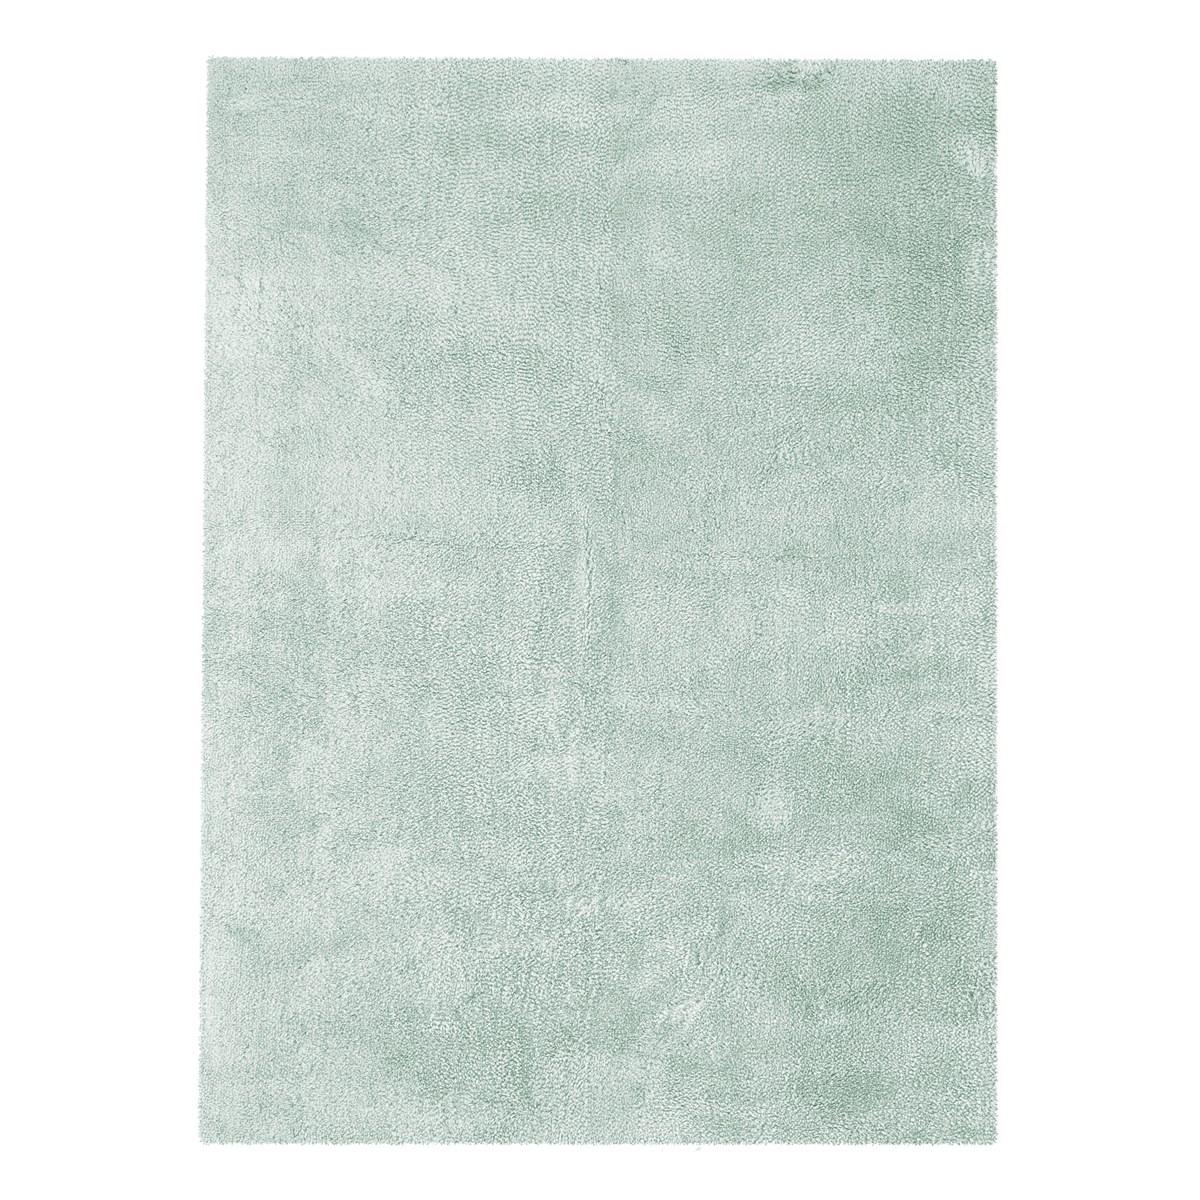 Tapis shaggy en Polyester Bleu ciel 160x230 cm